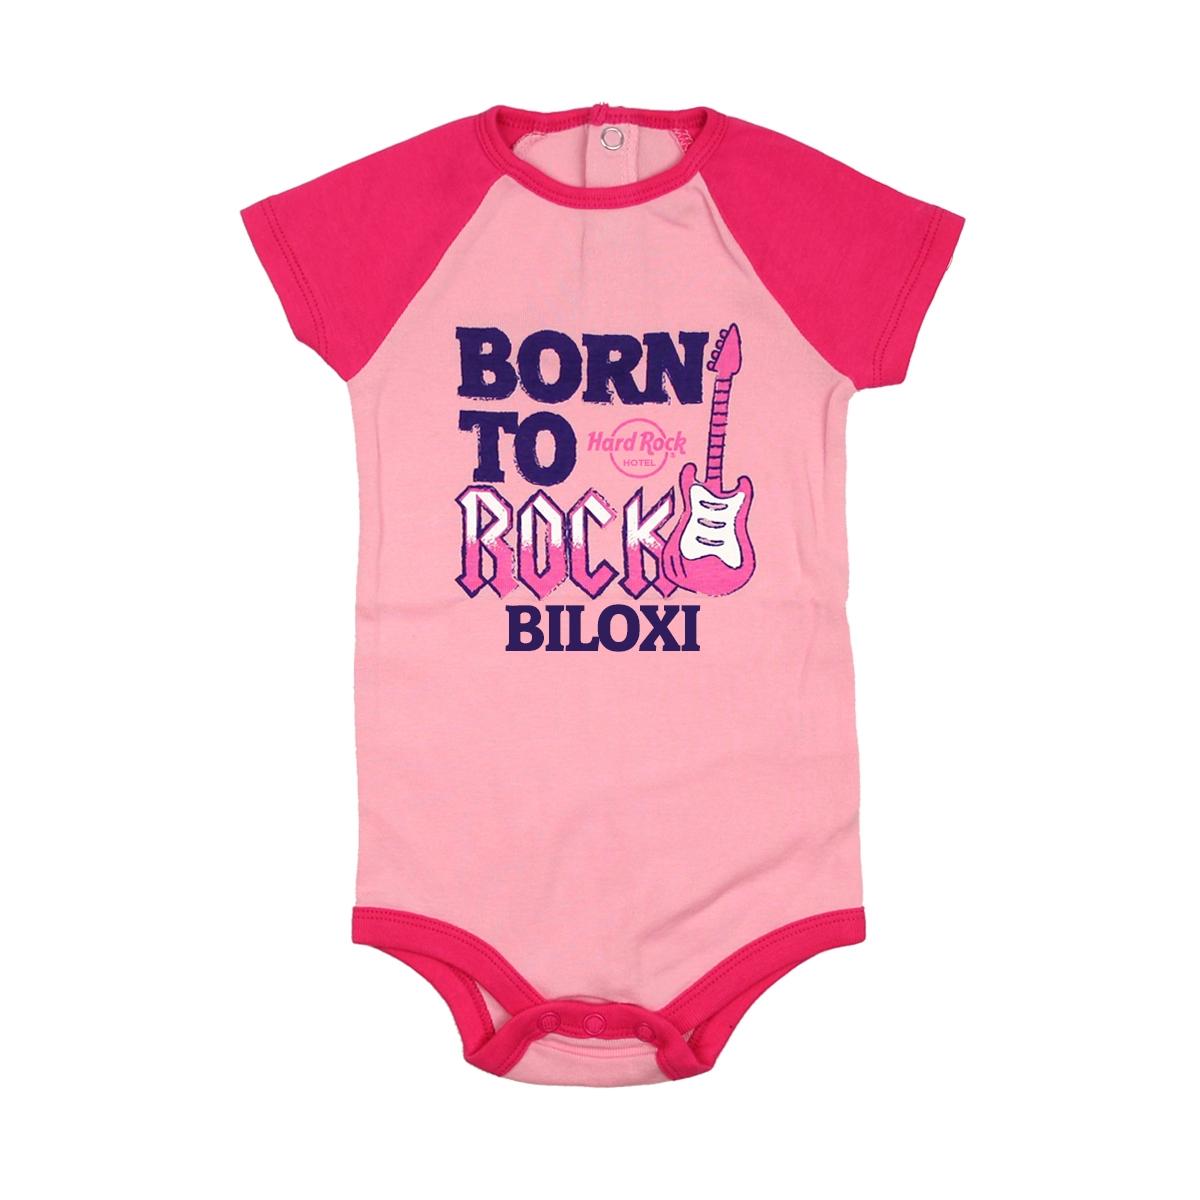 Infant Colorblock Raglan Onesie Biloxi Hotel 0